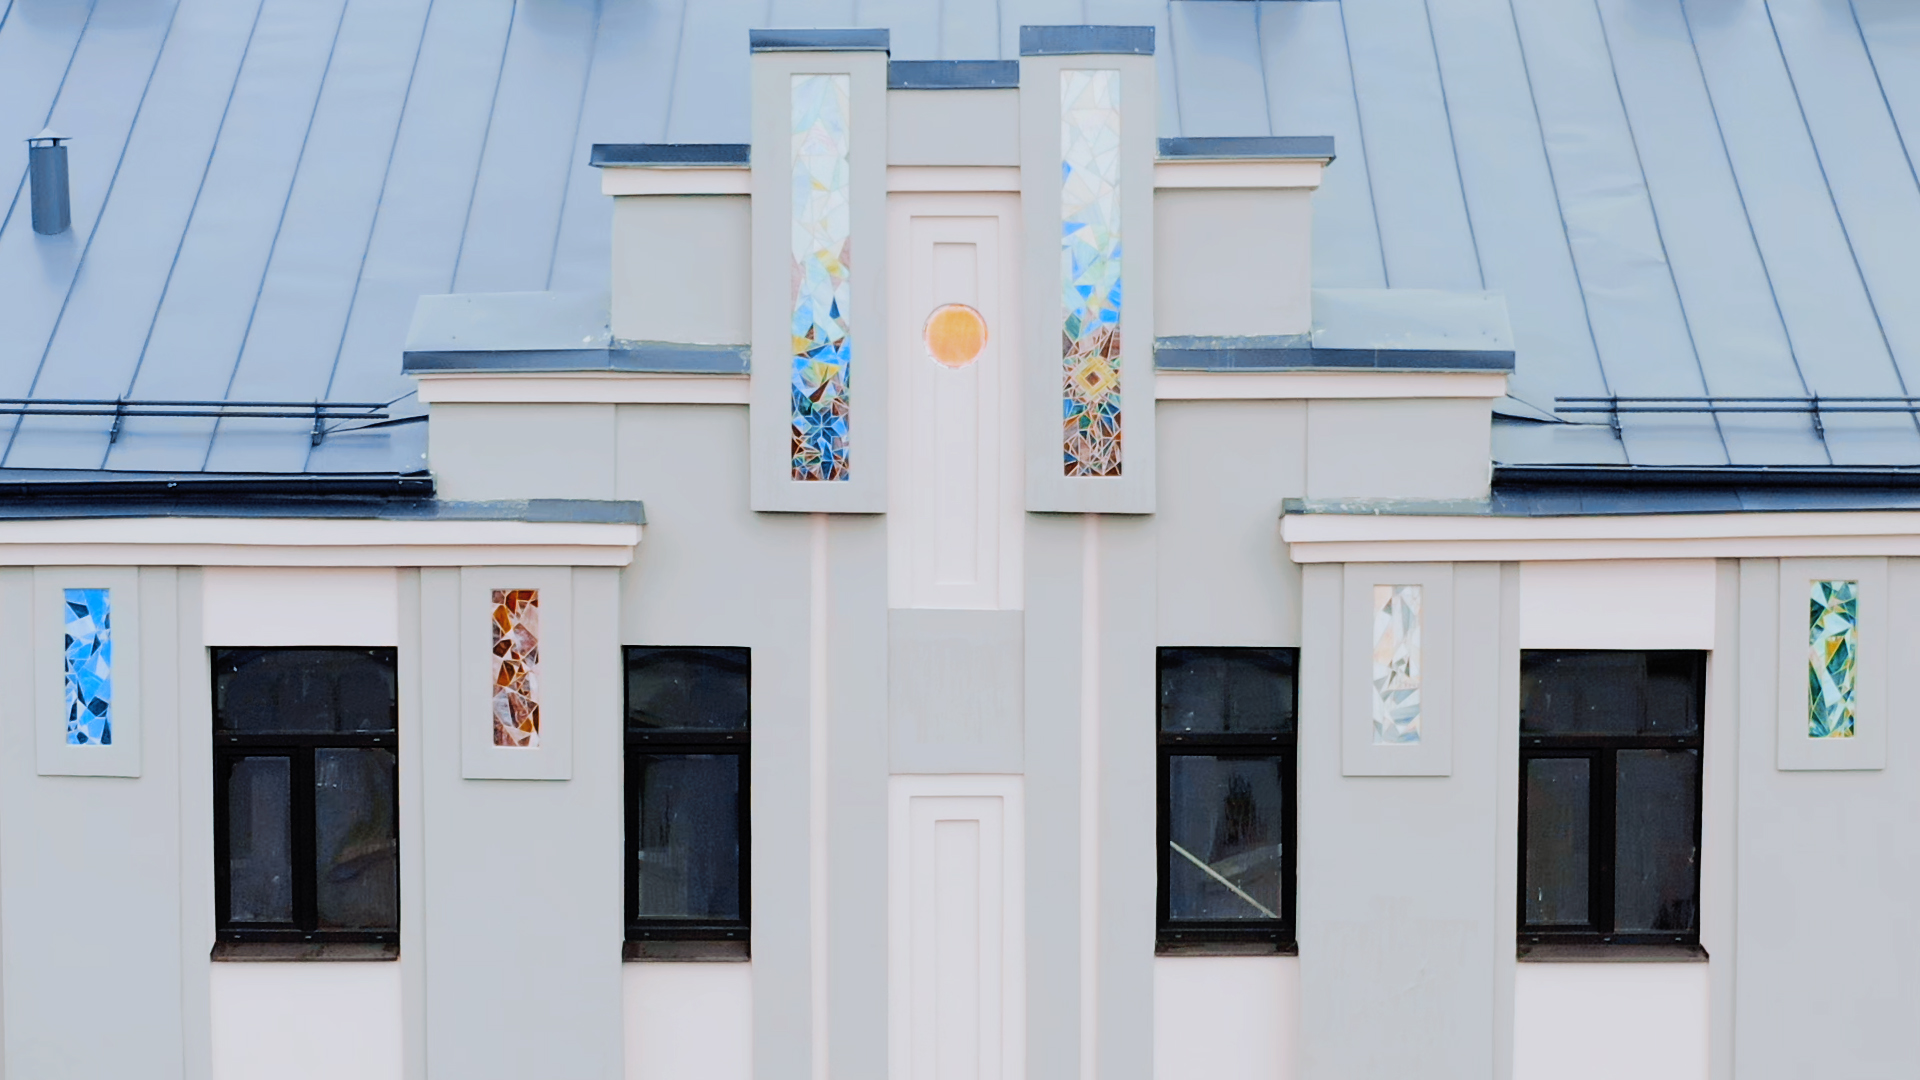 Custom Handmade Stained Glass. Artist - Anna Varnase. Wielona nami glass mosaice pannel decor. Vilanu 14. Glass Point